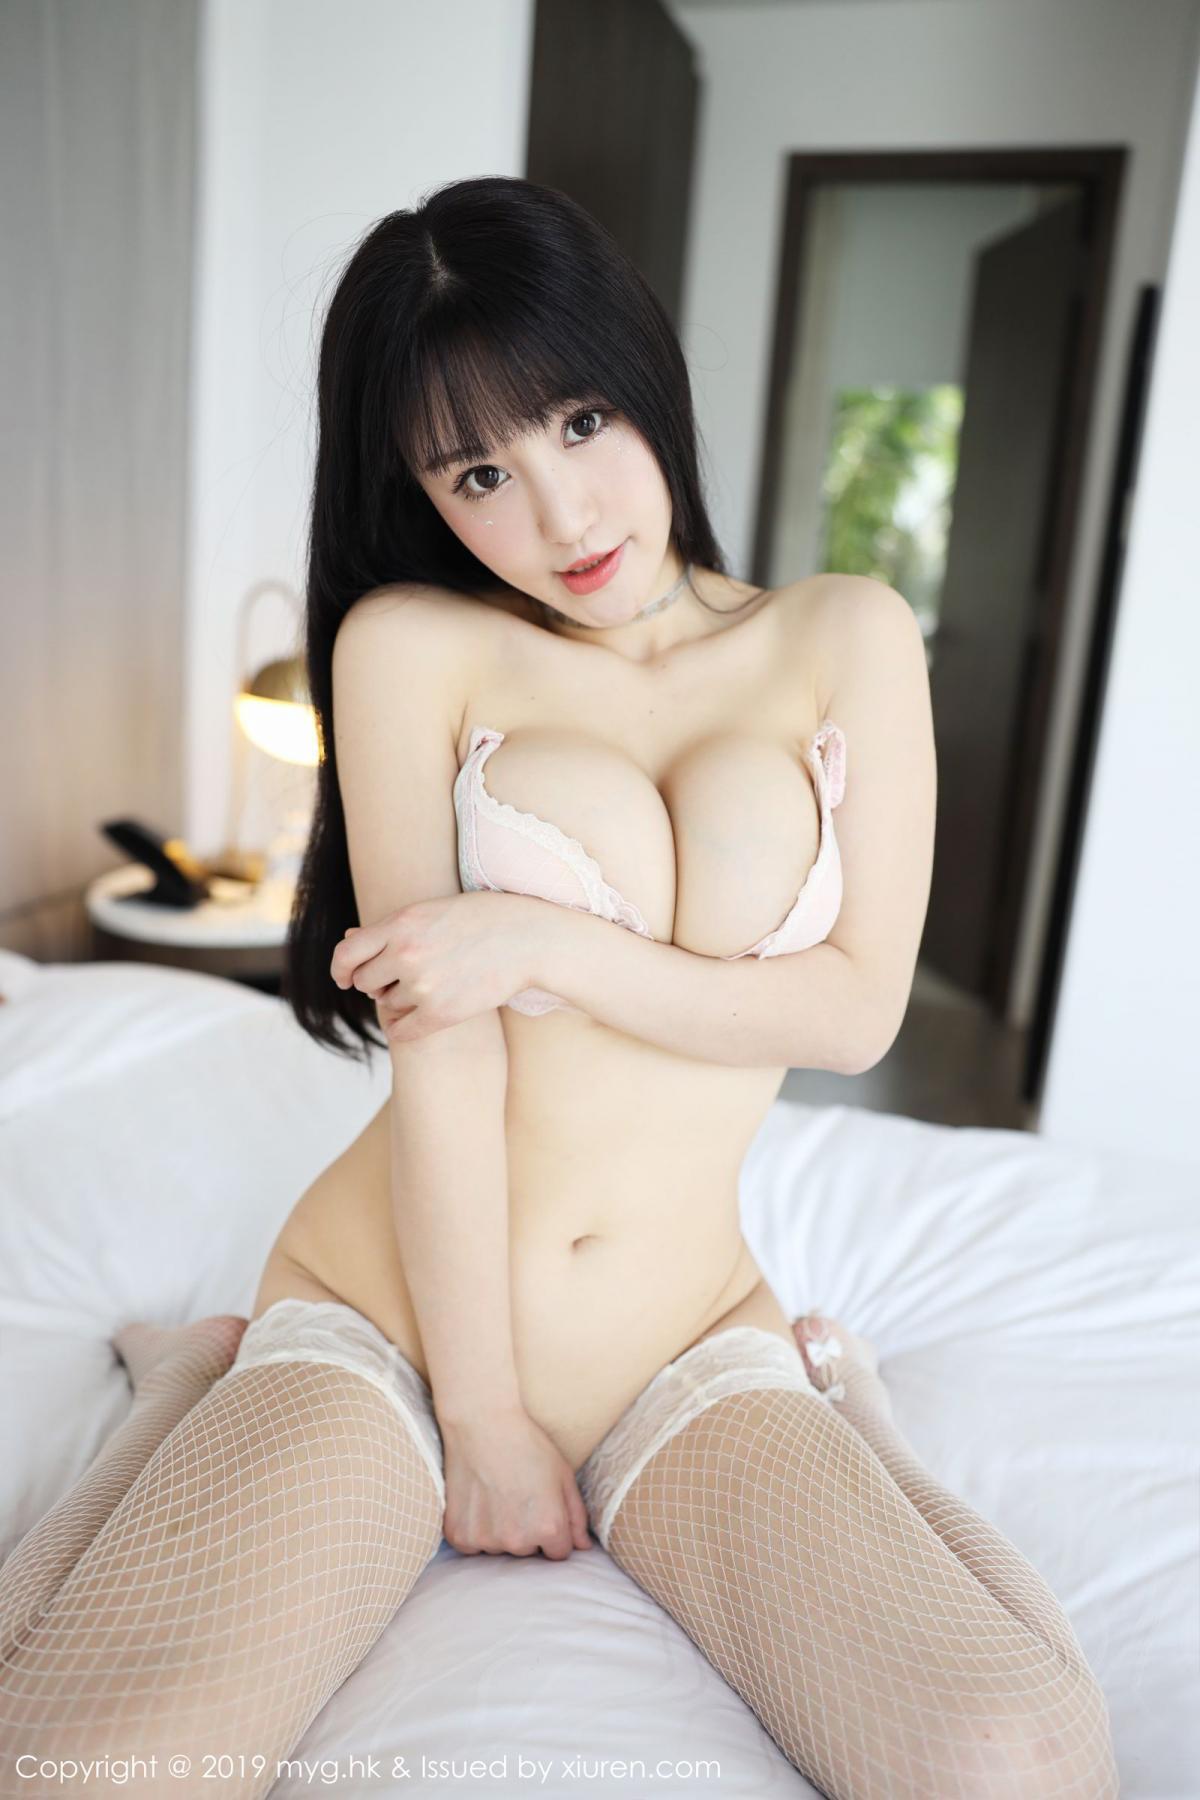 MyGirl Vol. 385 Zhu Ke Er